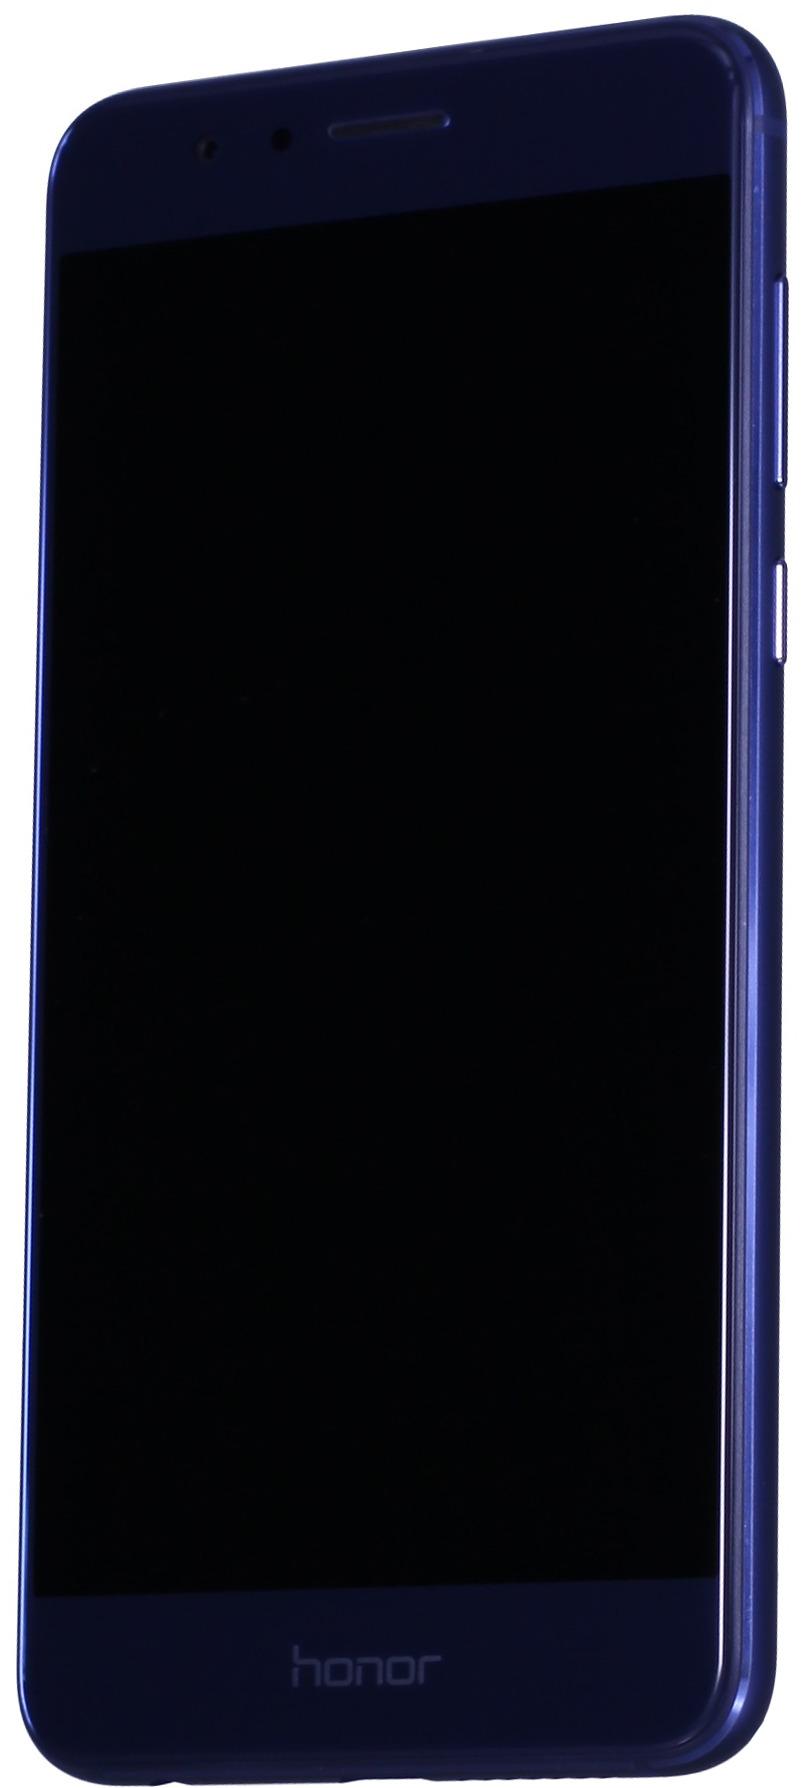 Huawei Honor 8 32GB sapphire blue